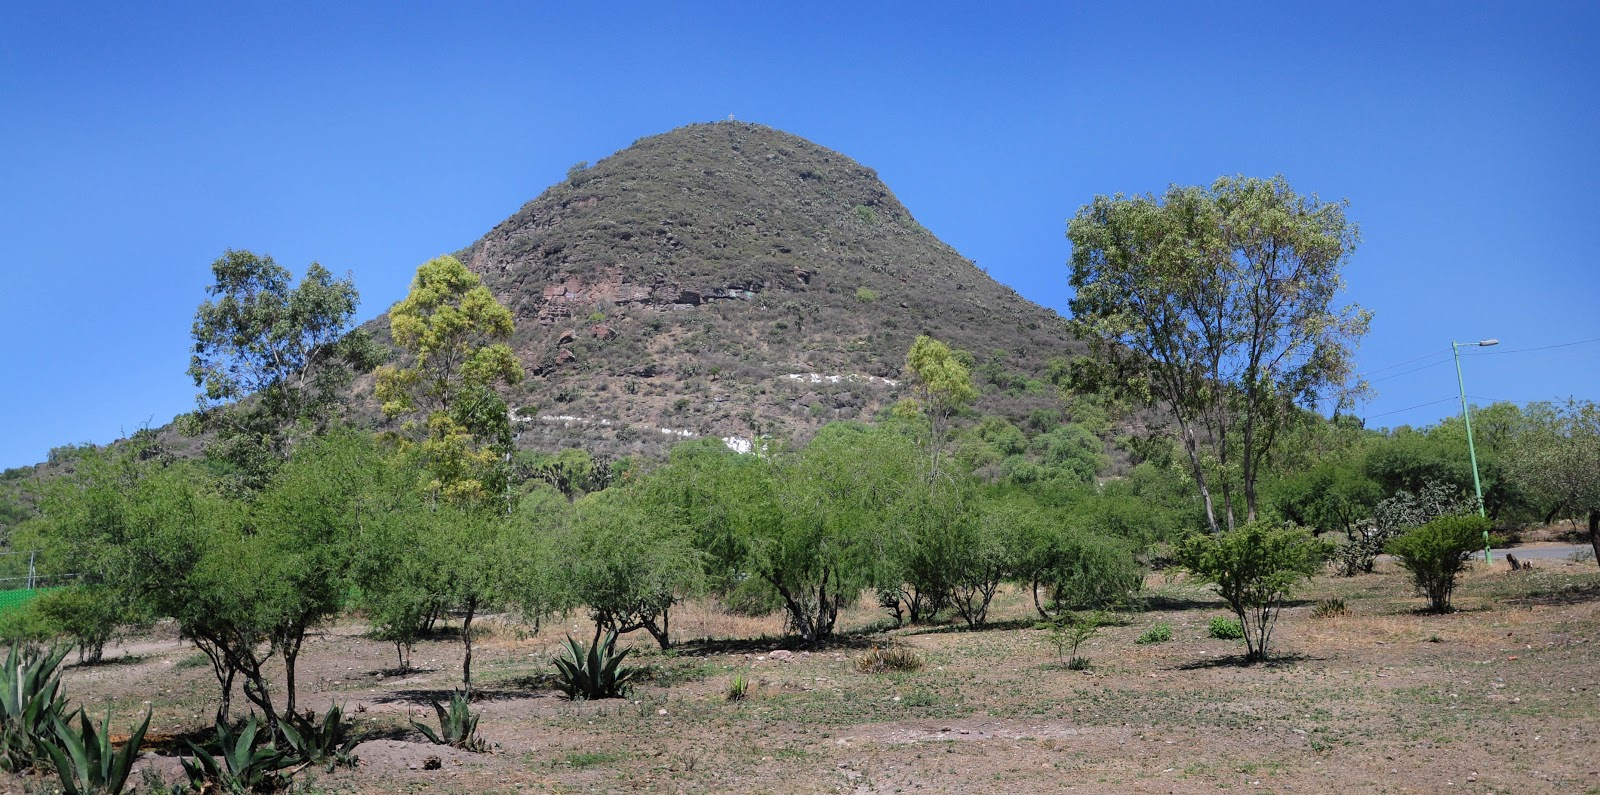 Turismo mexiquense municipios ecatepec pasado y presente for Jardin 7 hermanos ecatepec